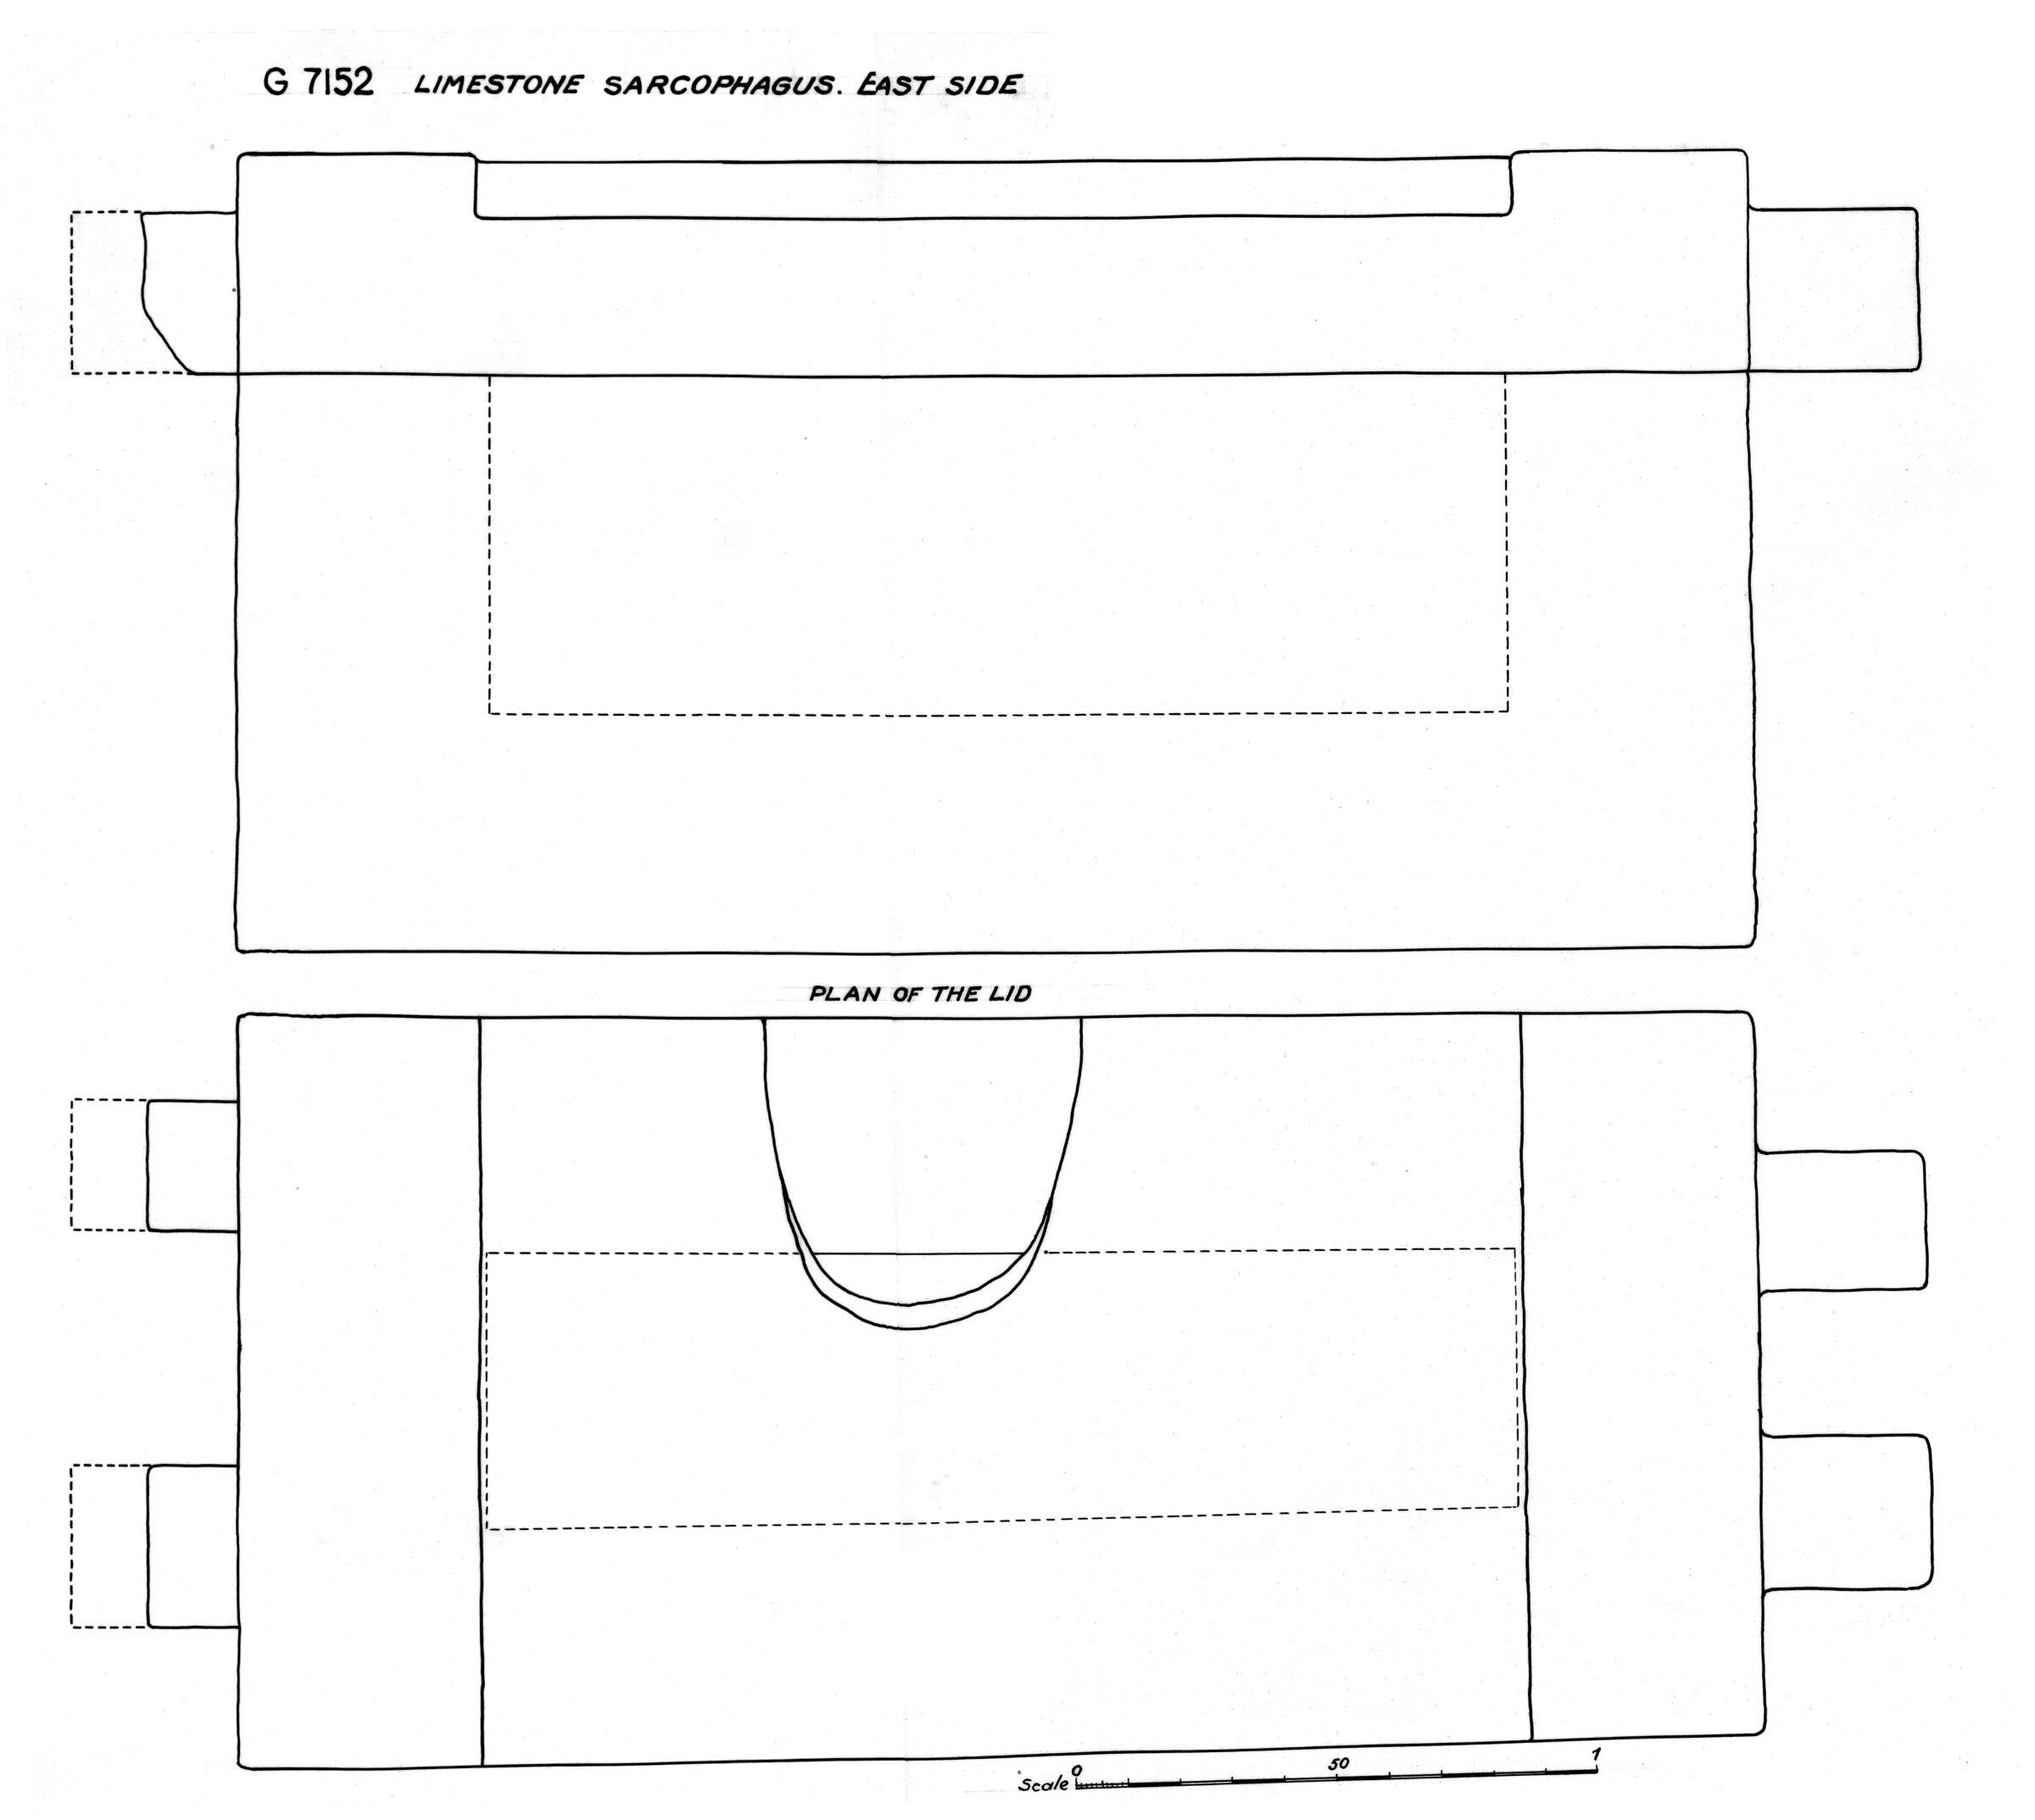 Drawings: G 7152, Shaft A, sarcophagus